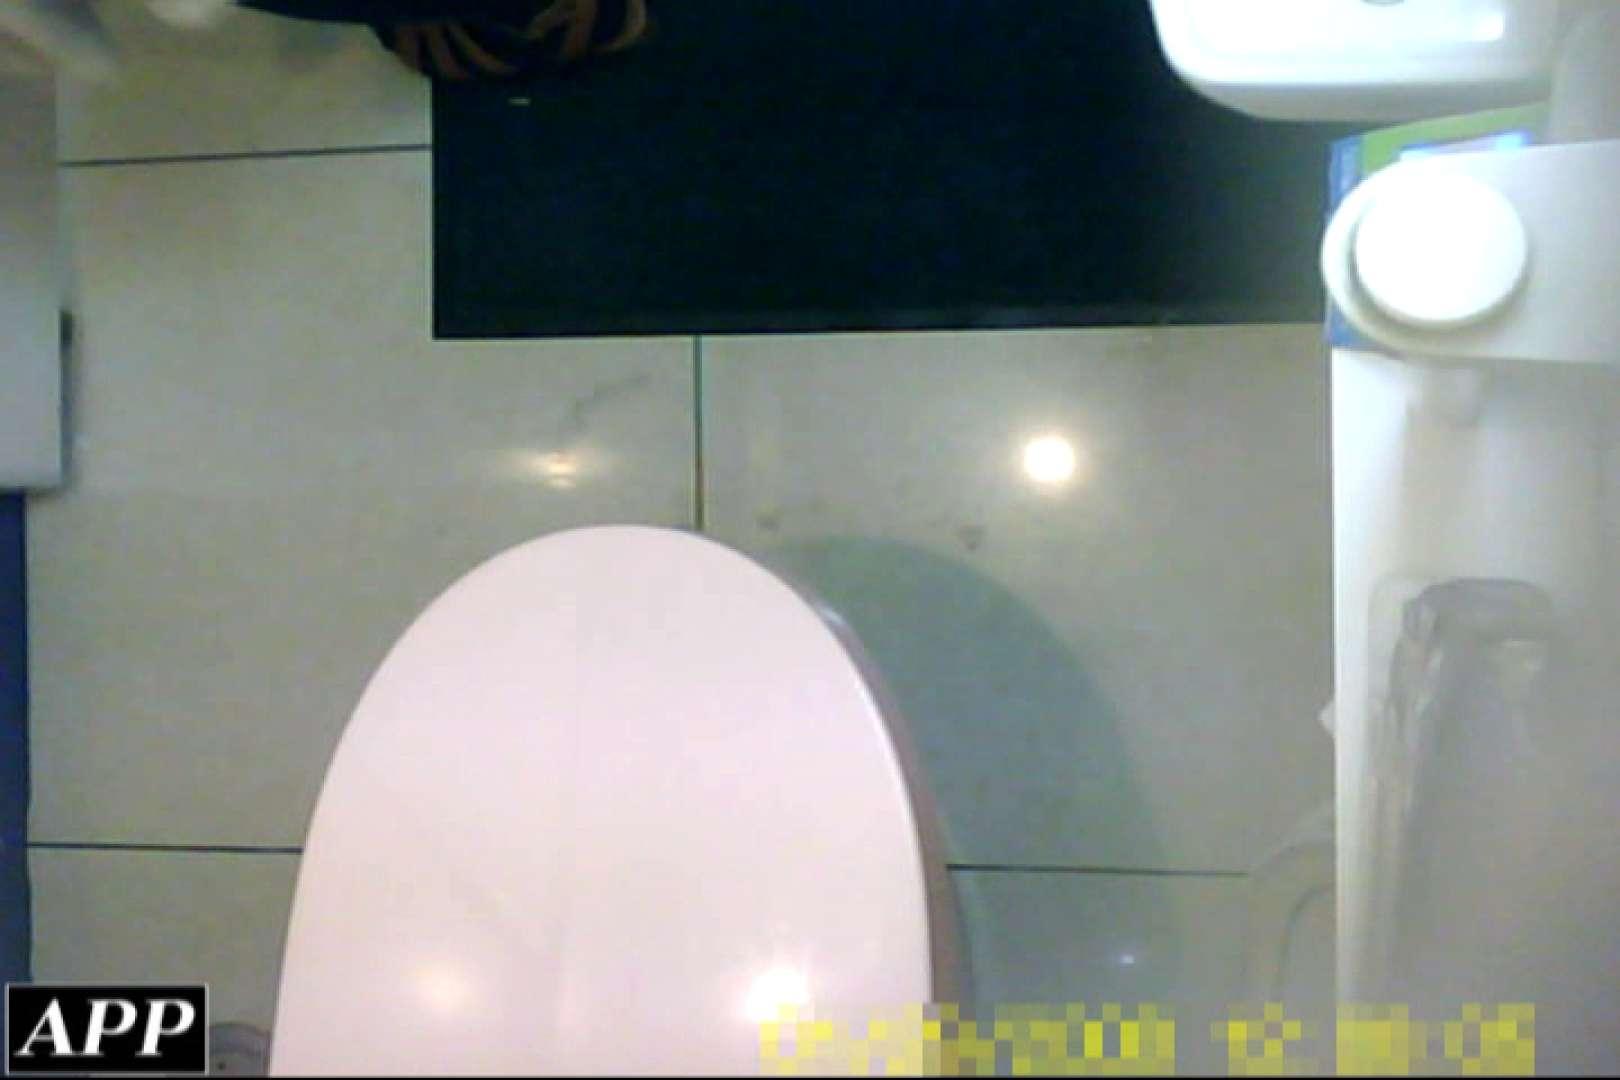 3視点洗面所 vol.110 OLハメ撮り  111Pix 20